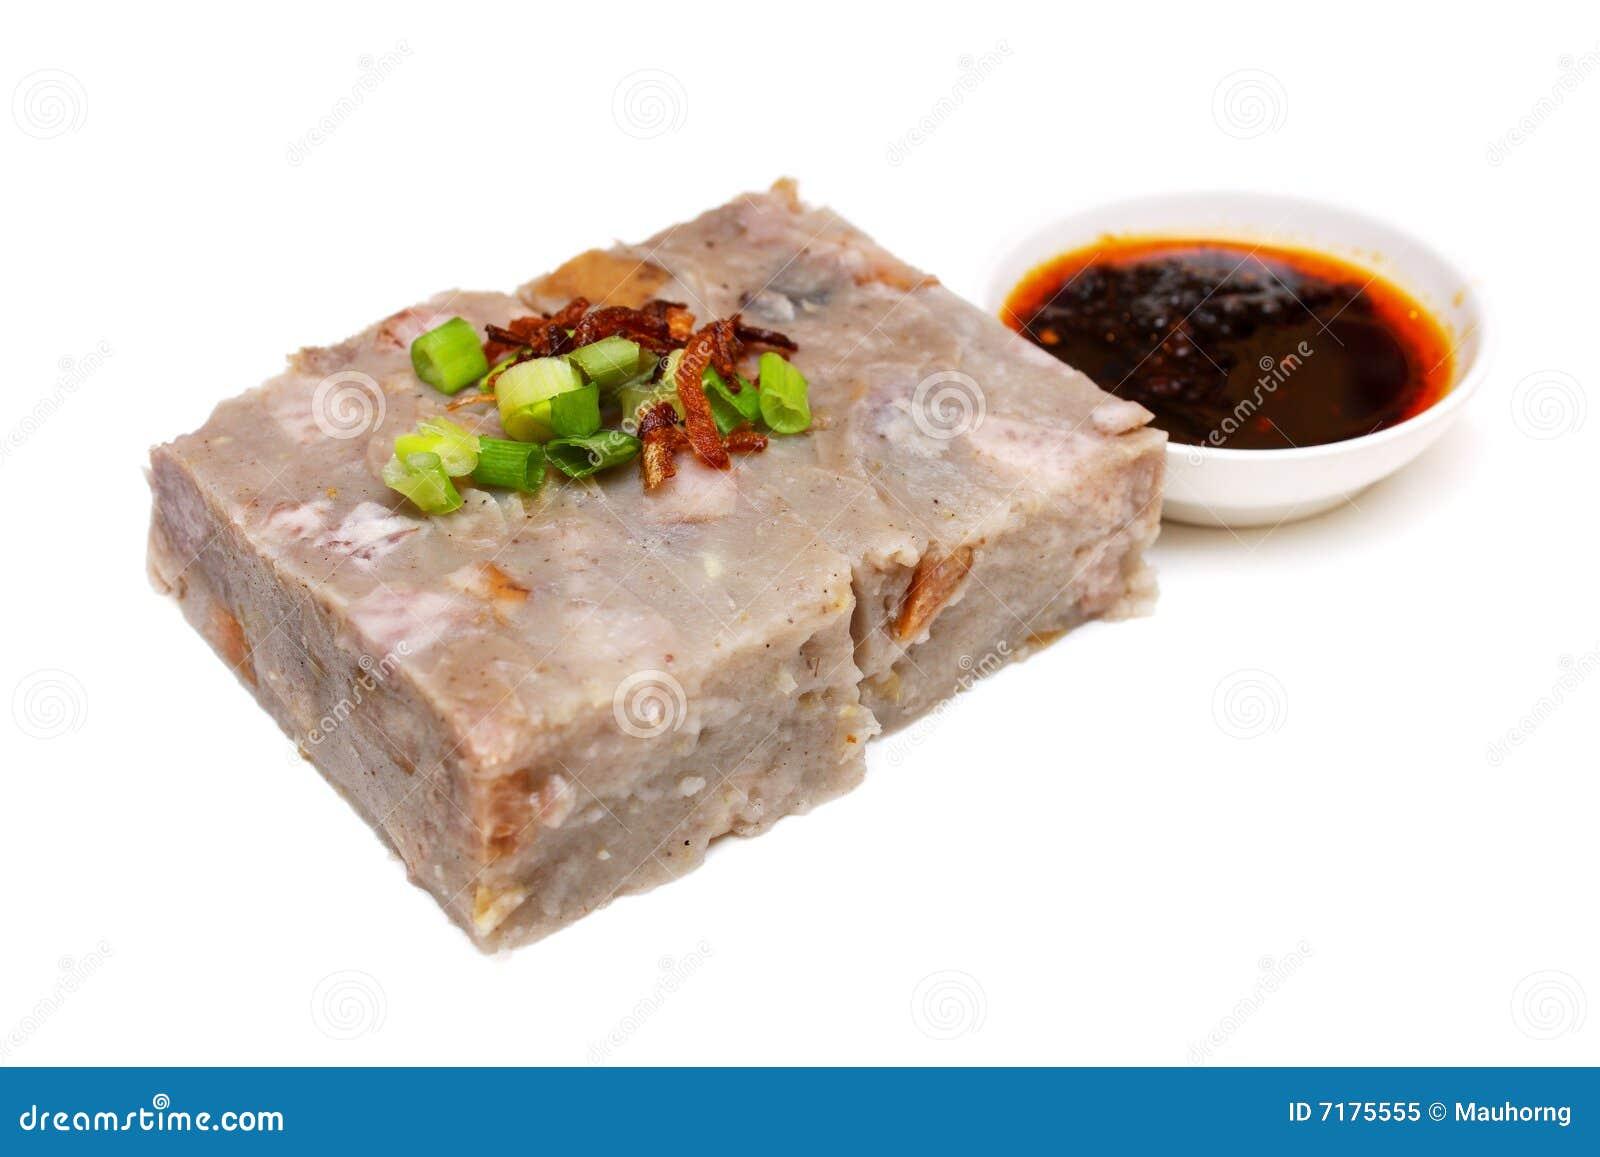 Korean Yam Cake Recipe: Yam Cake Royalty Free Stock Photo